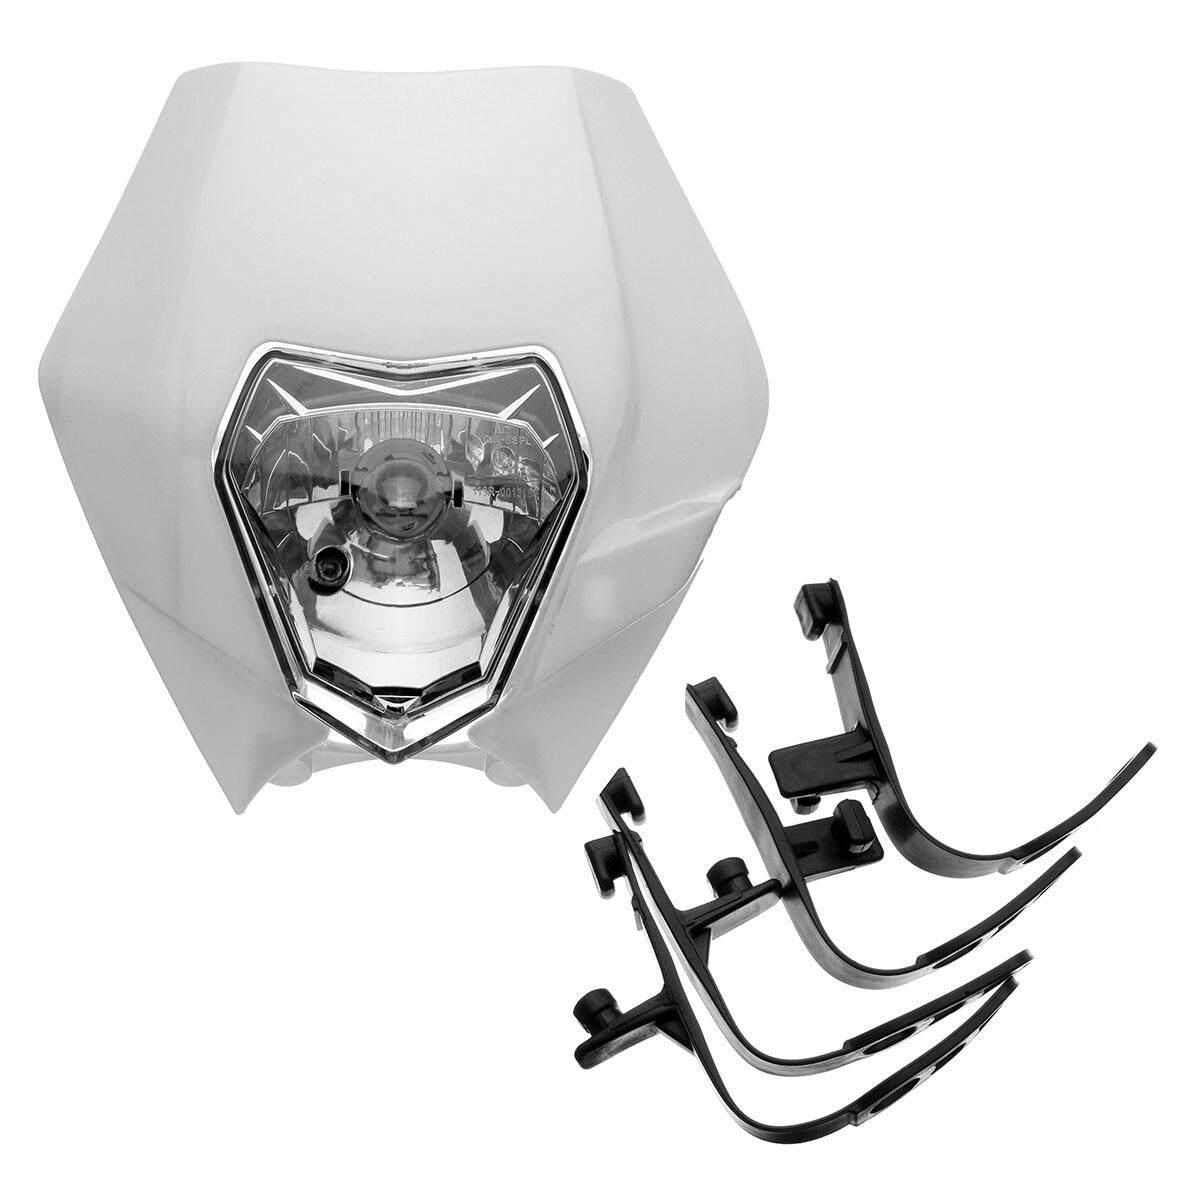 Motorcycle Dirt Bike Motocross Supermoto Universal Headlight KTM SX EXC XCF SXF SMR Headlamp (White) - intl